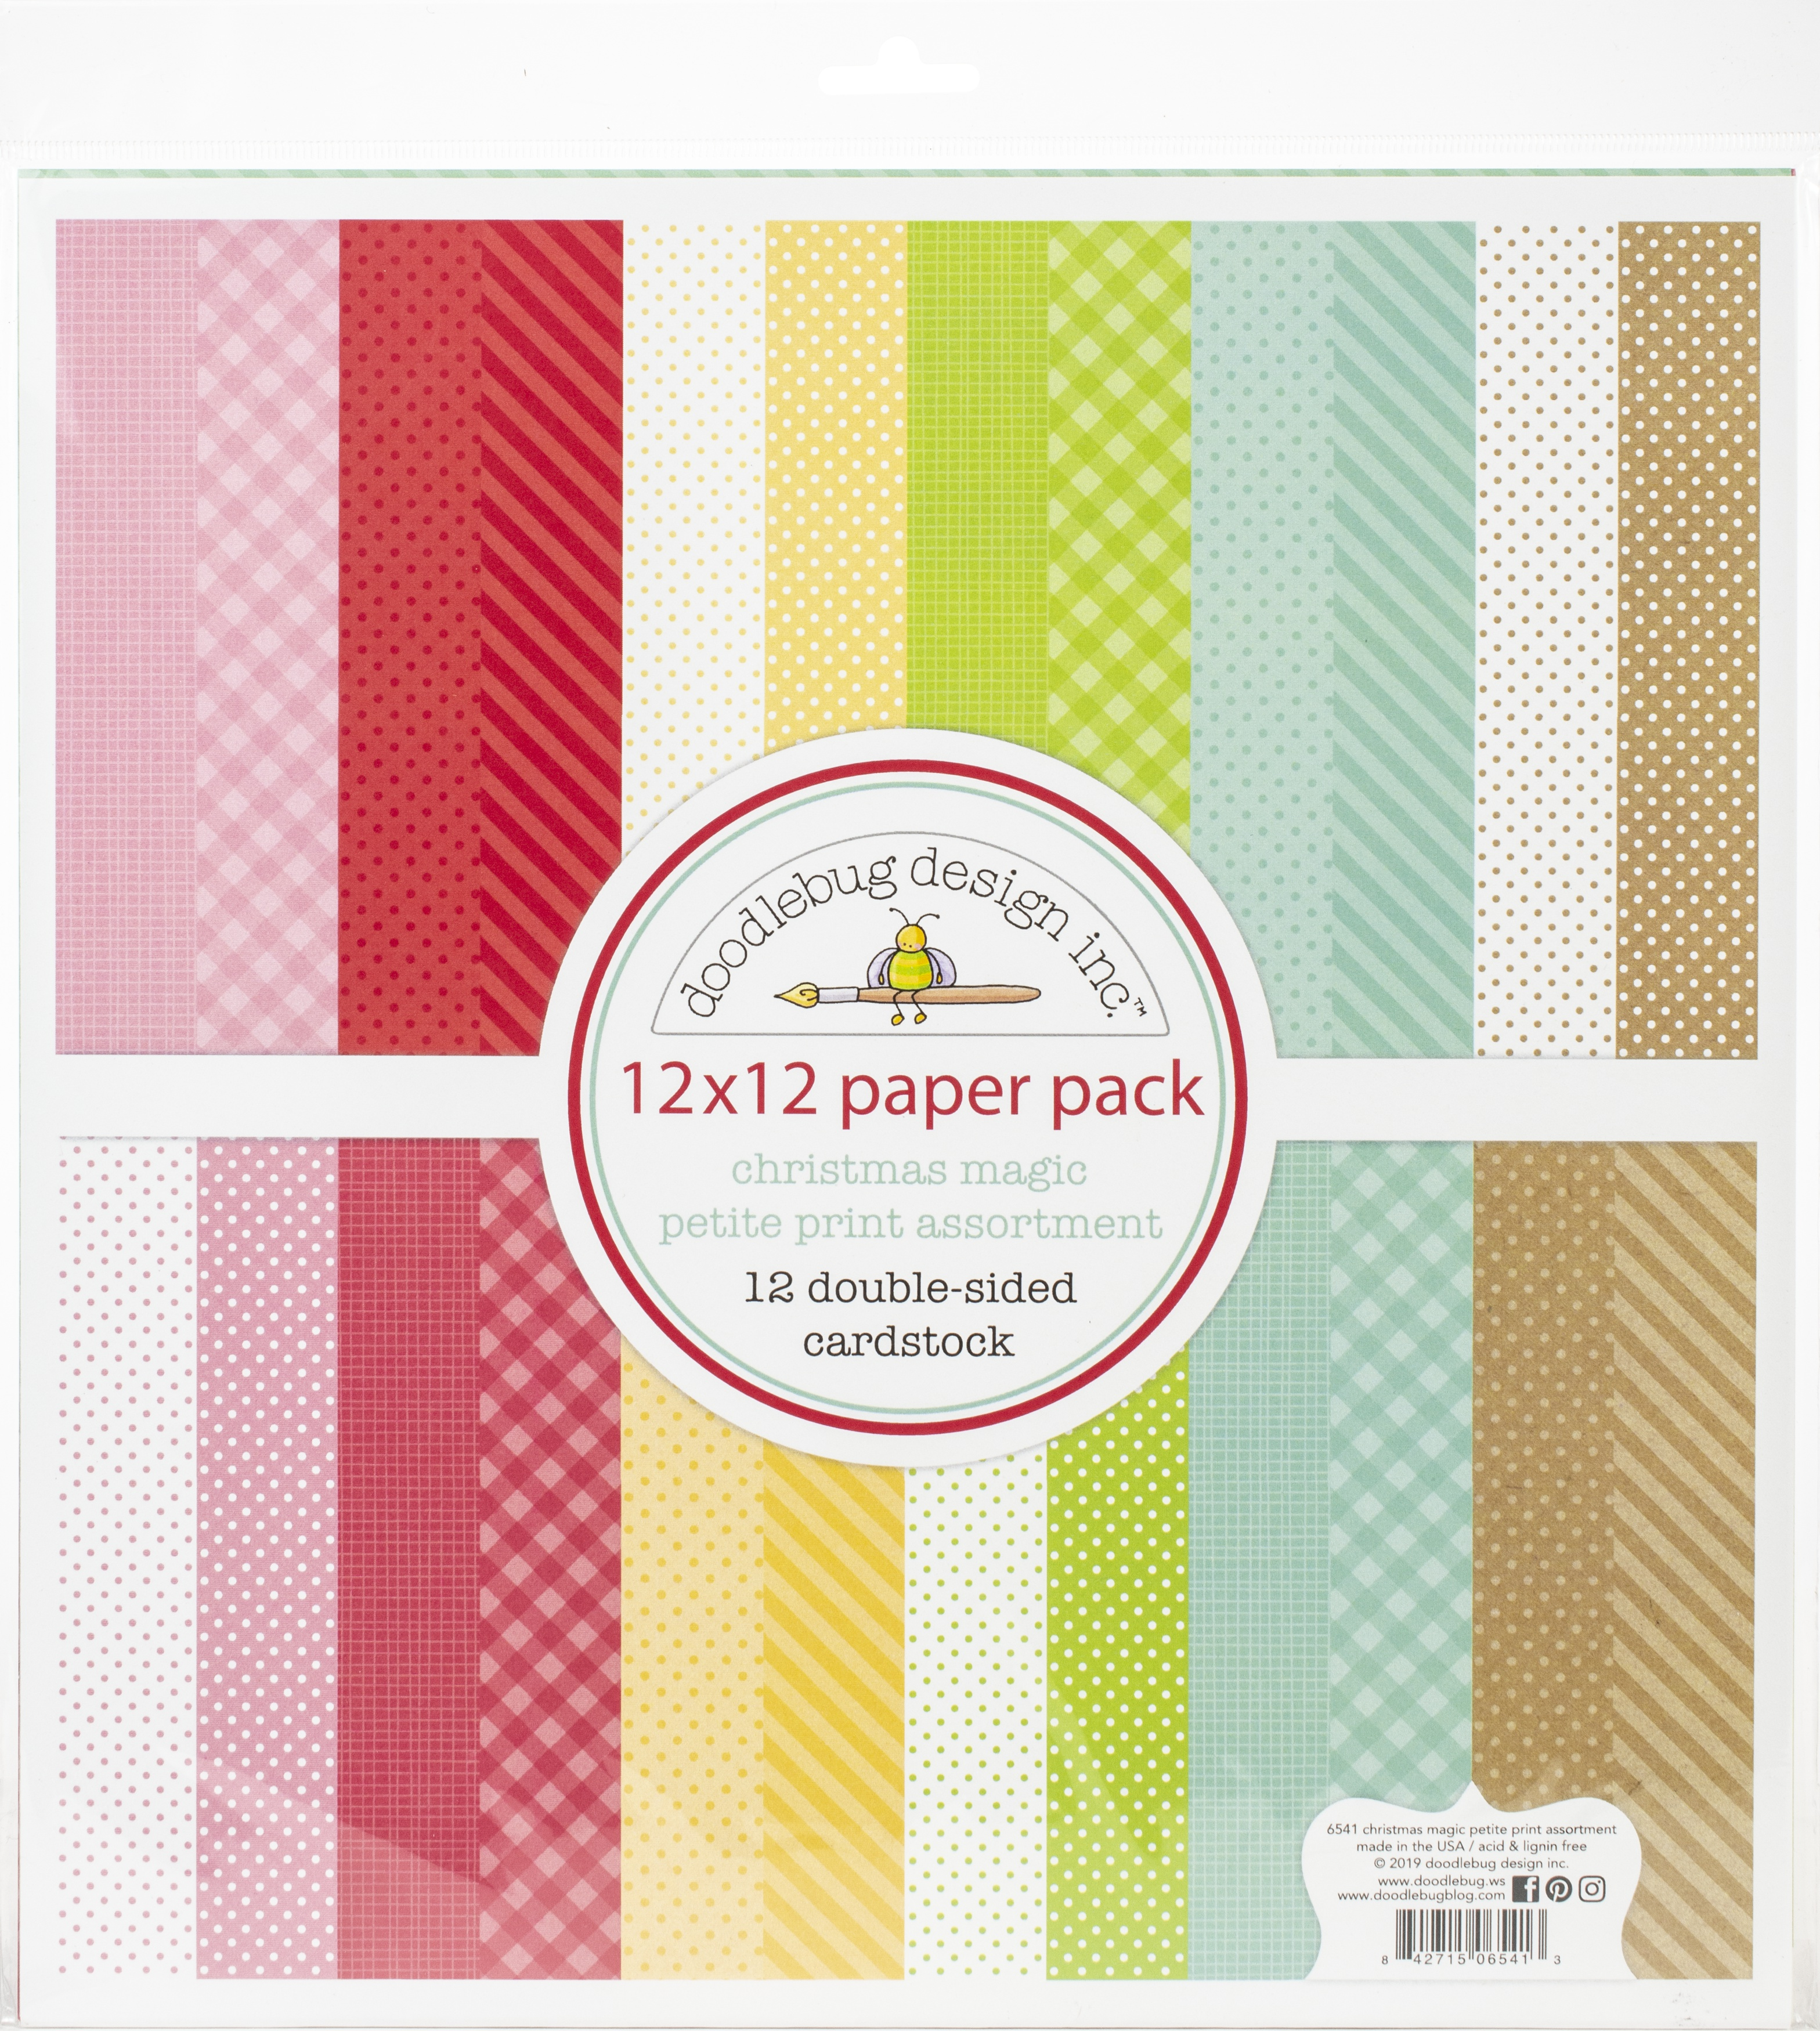 Doodlebug Petite Prints Double-Sided Cardstock 12X12 12/Pk-Christmas Magic, 12...